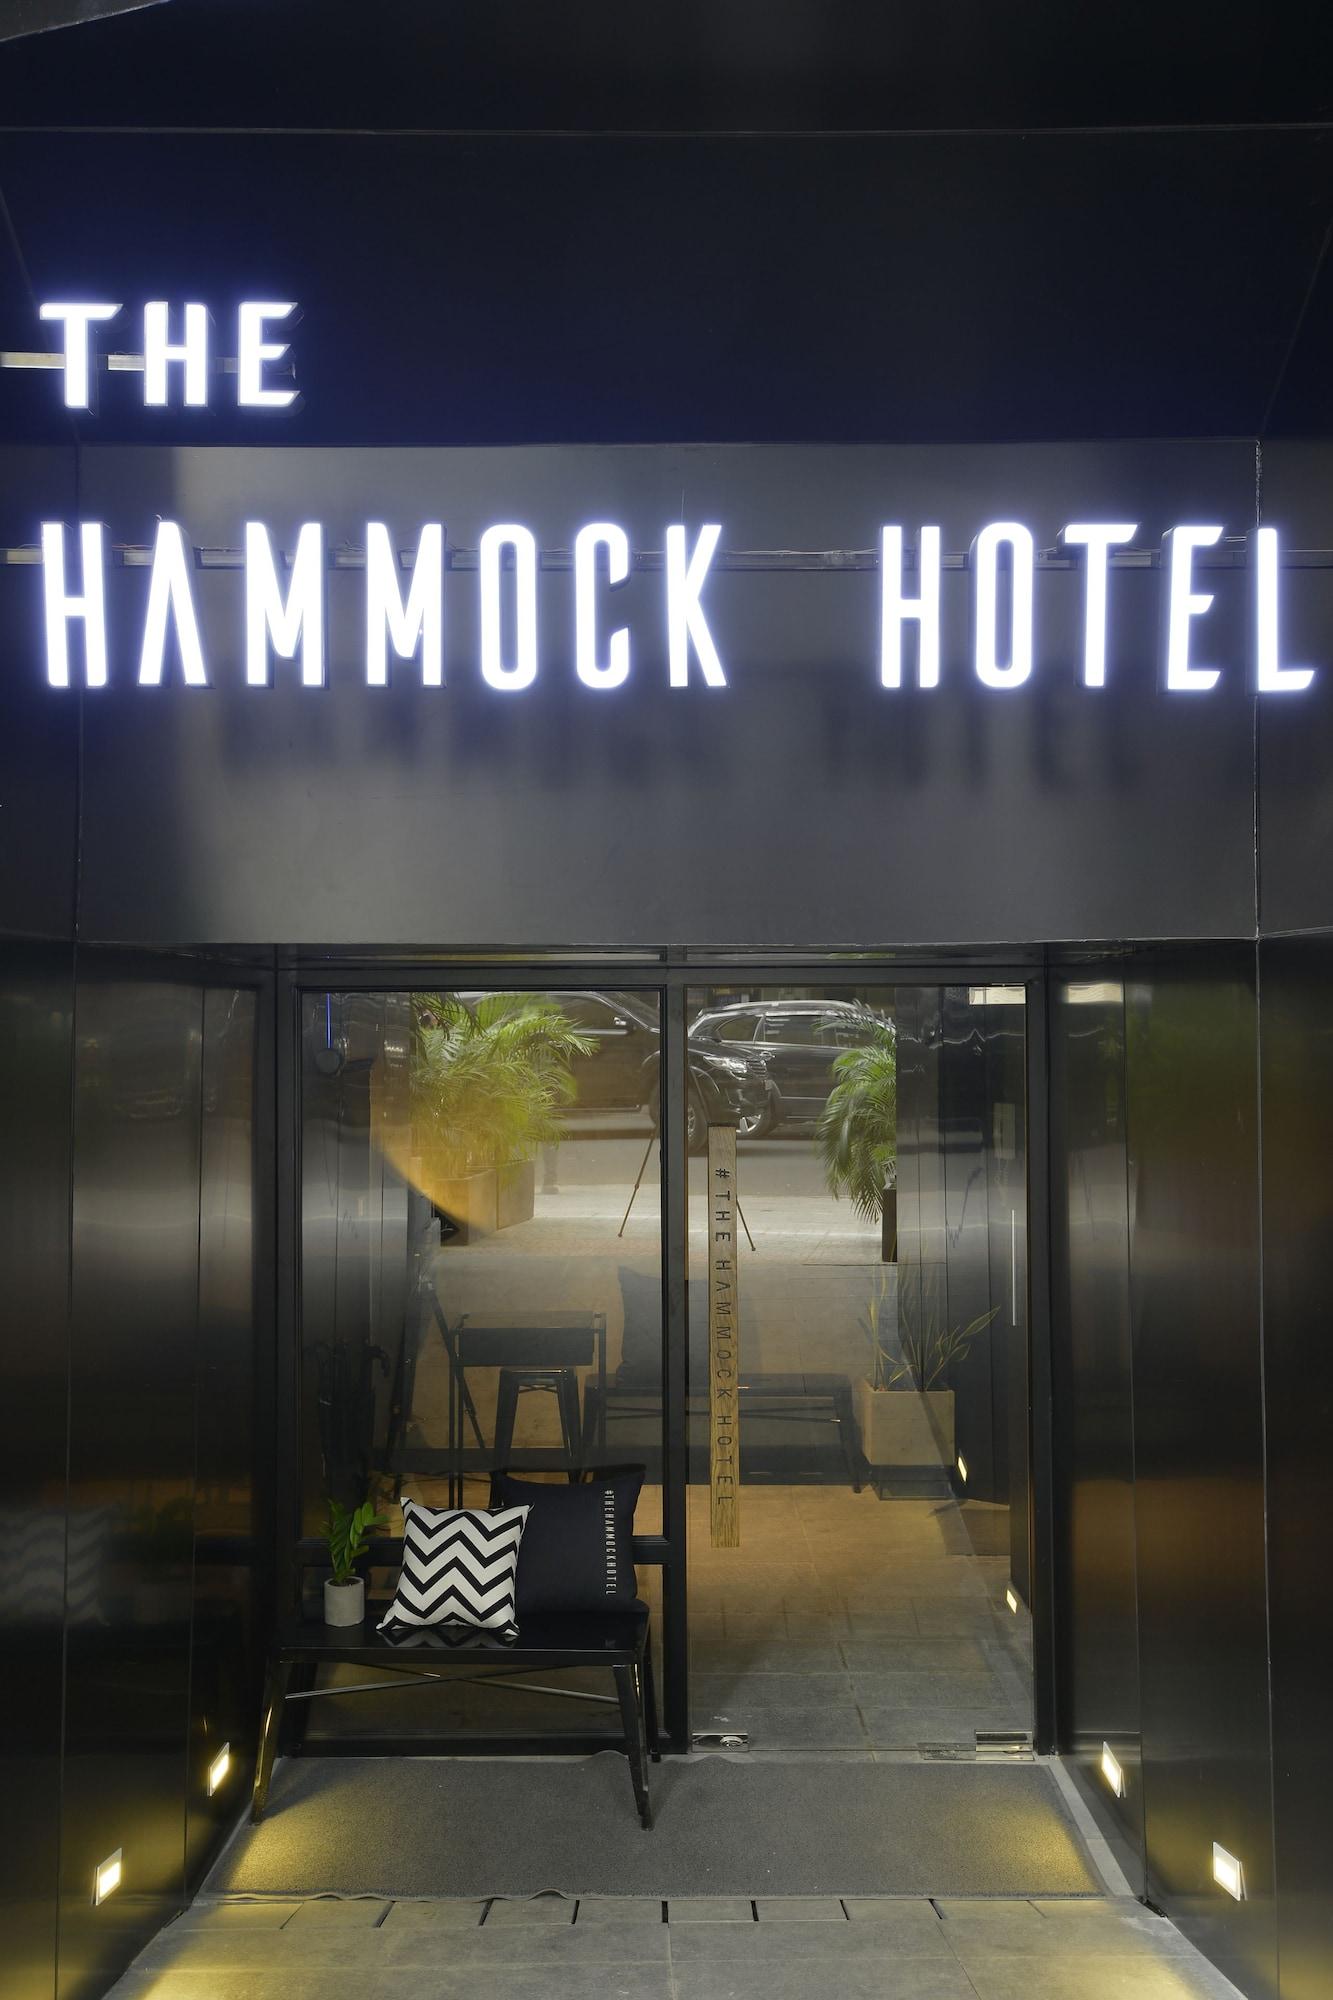 The Hammock Hotel Fine Arts Museum, Quận 1